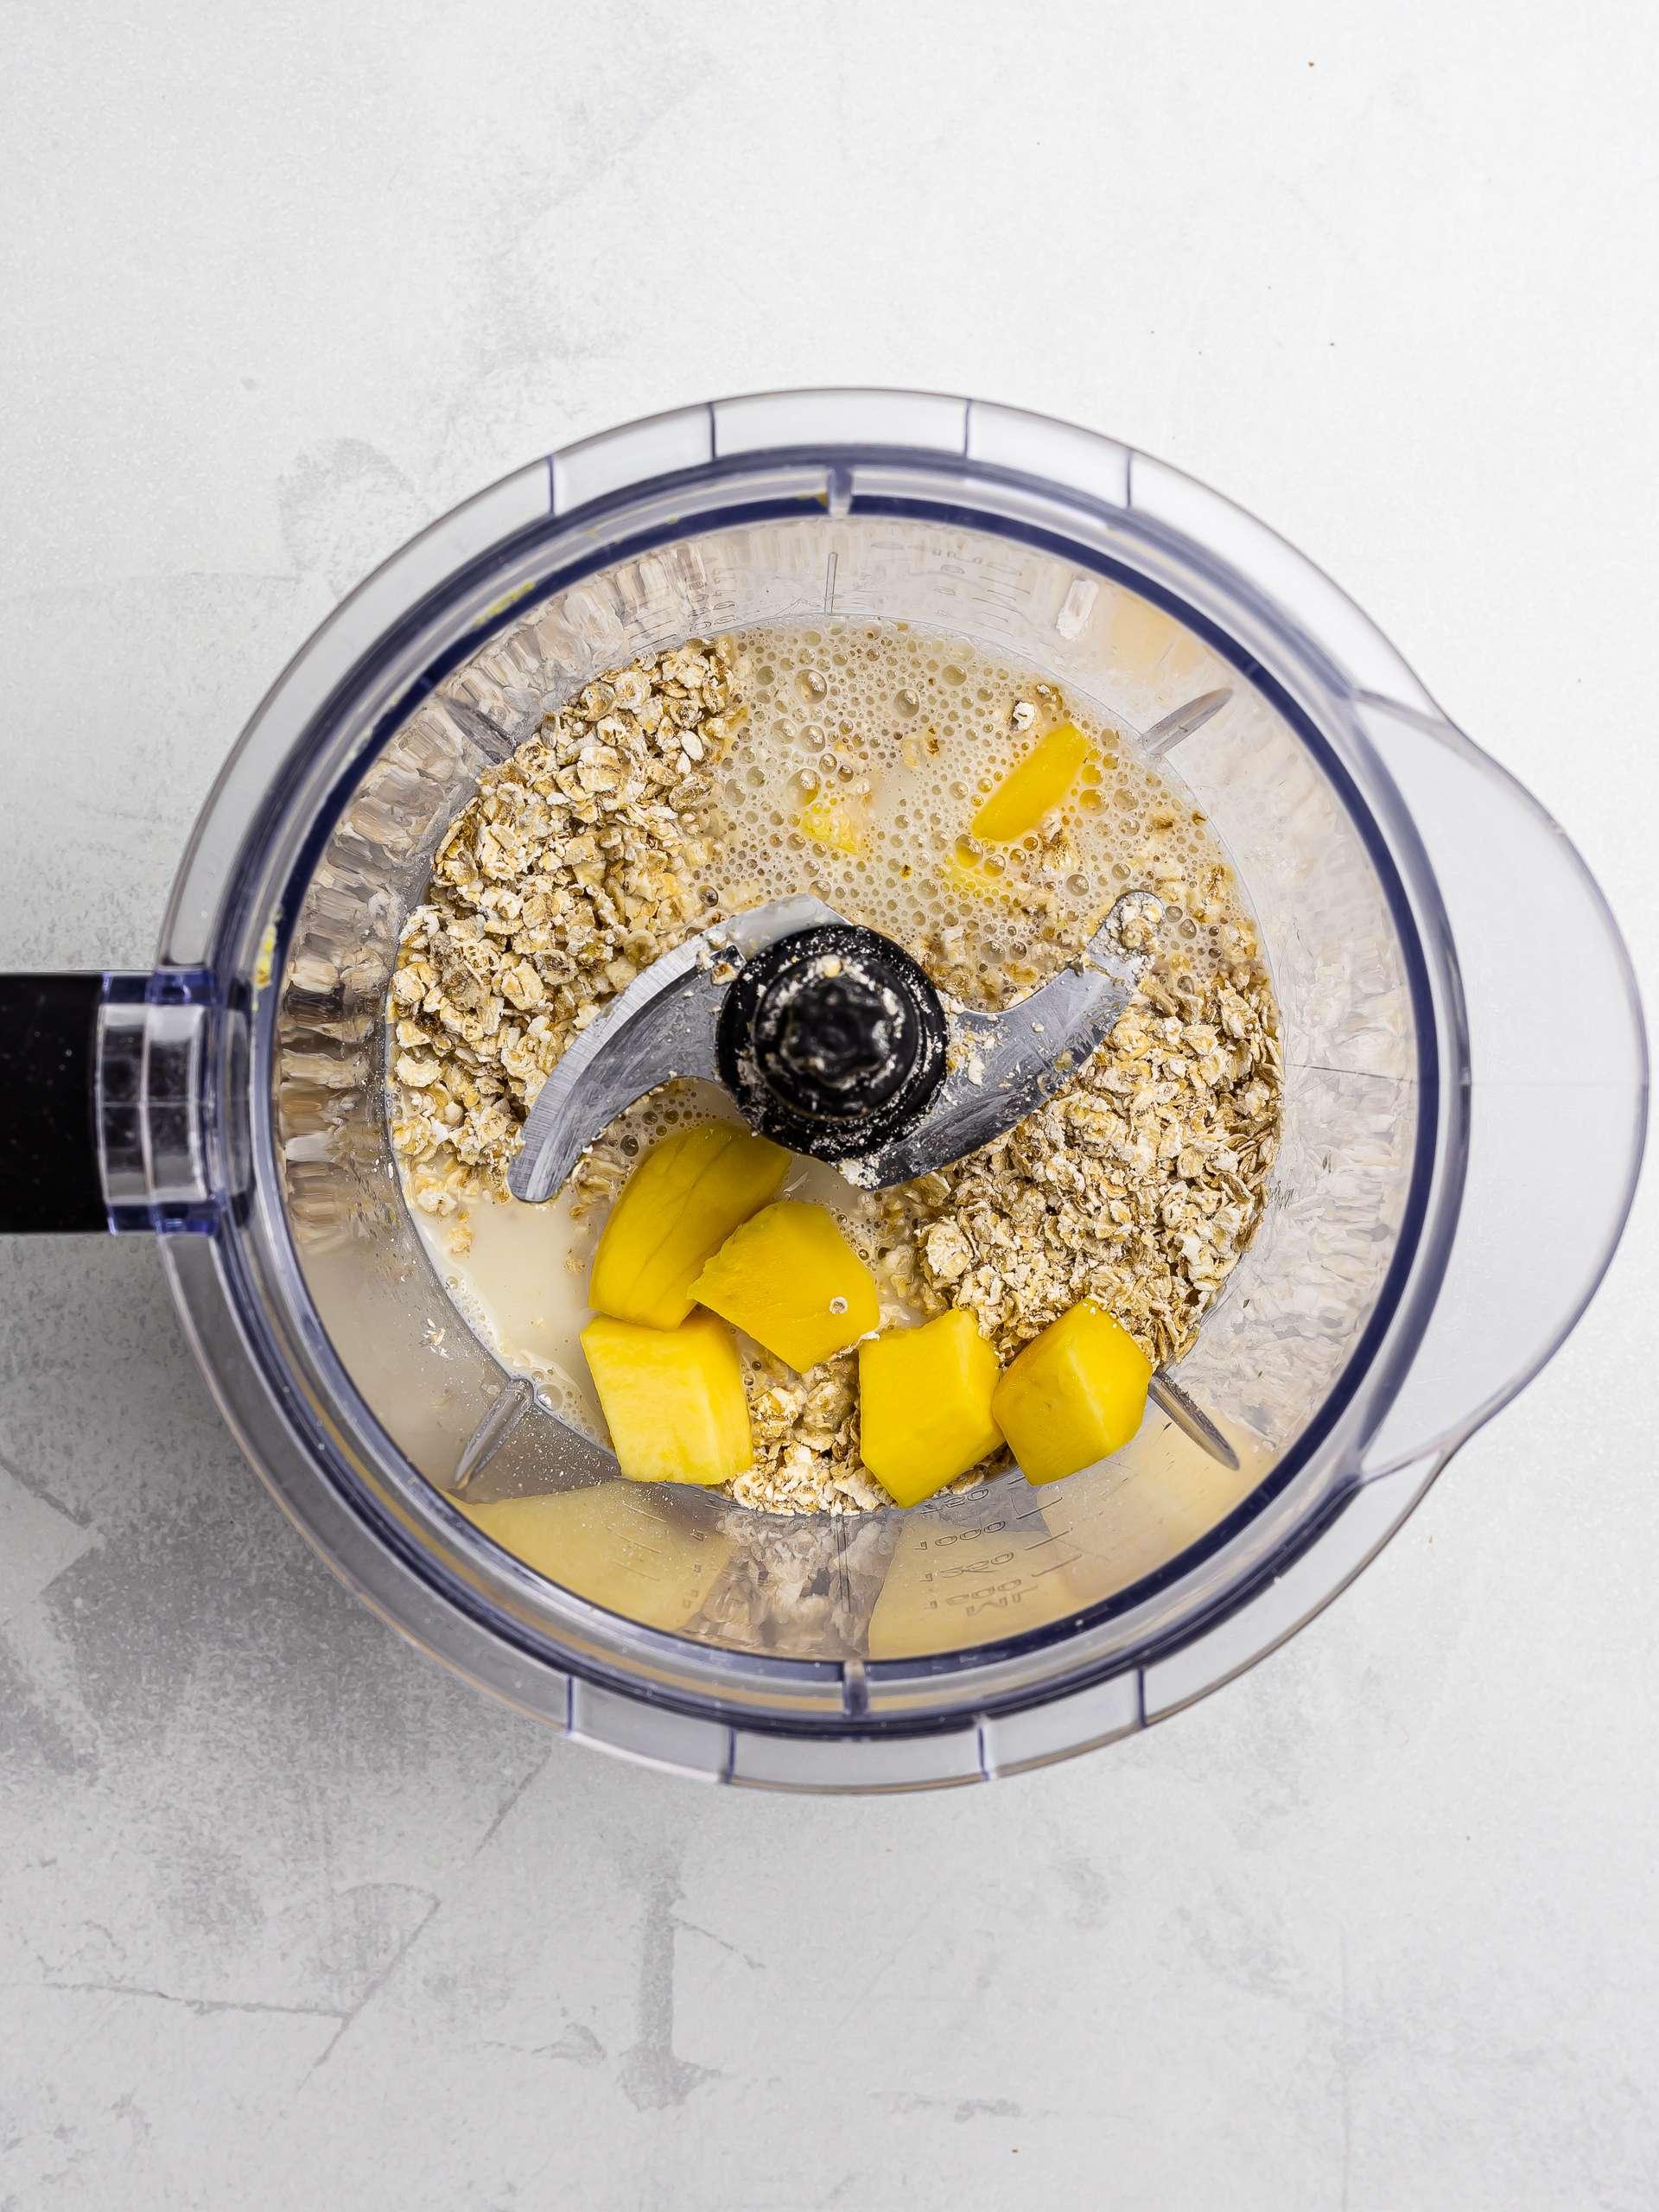 mango, oats, and oat milk in a blender